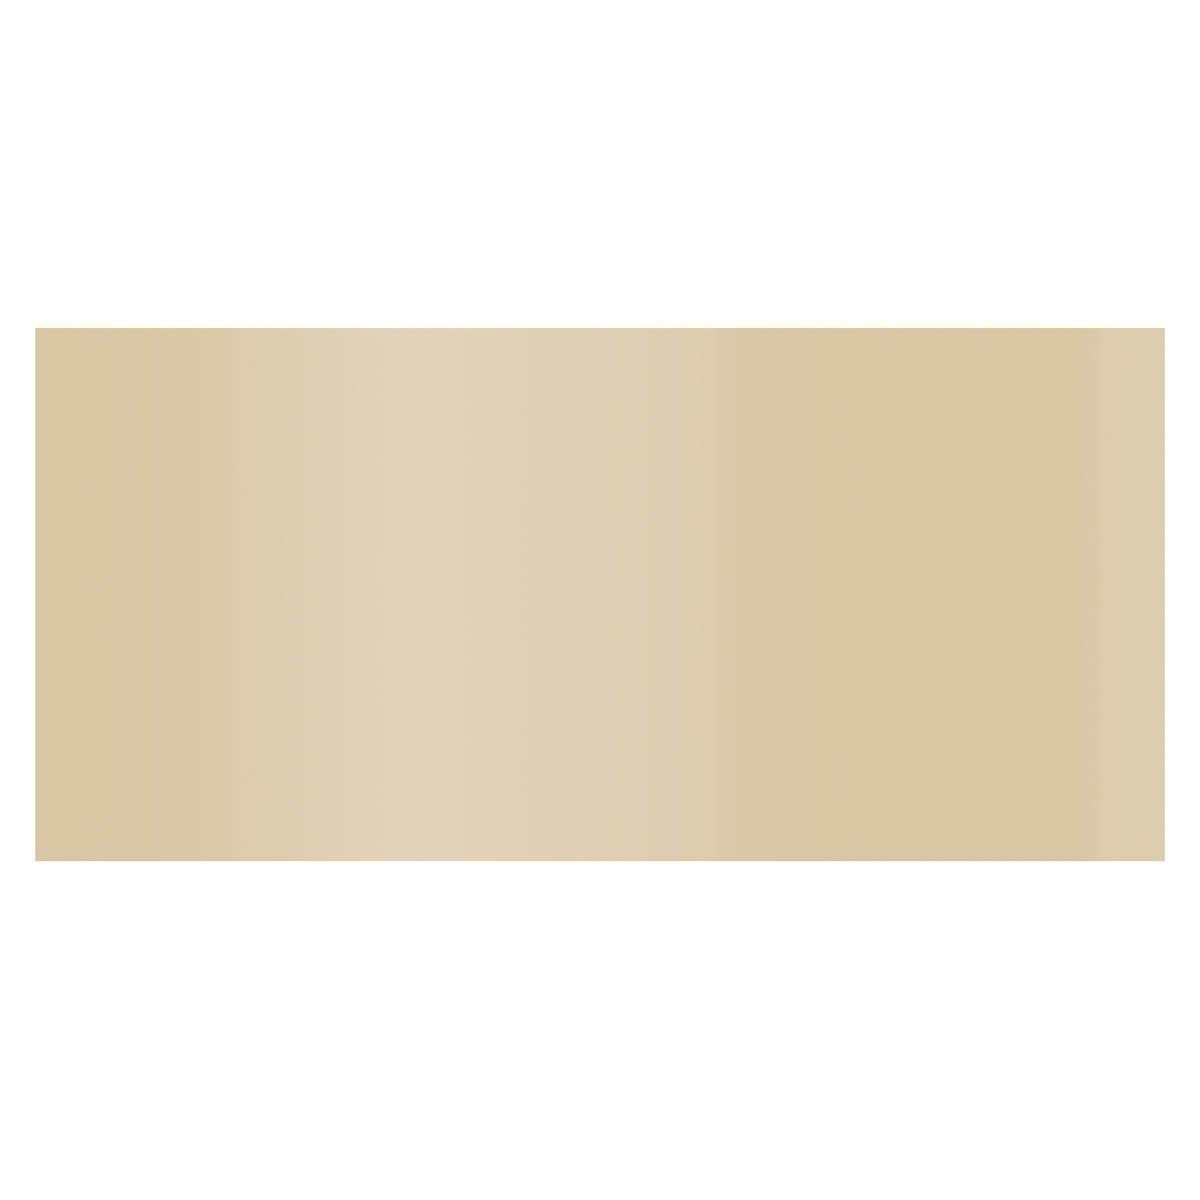 Waverly ® Inspirations Metallic Multi-Surface Acrylic Paint - Moonstone, 2 oz. - 60690E